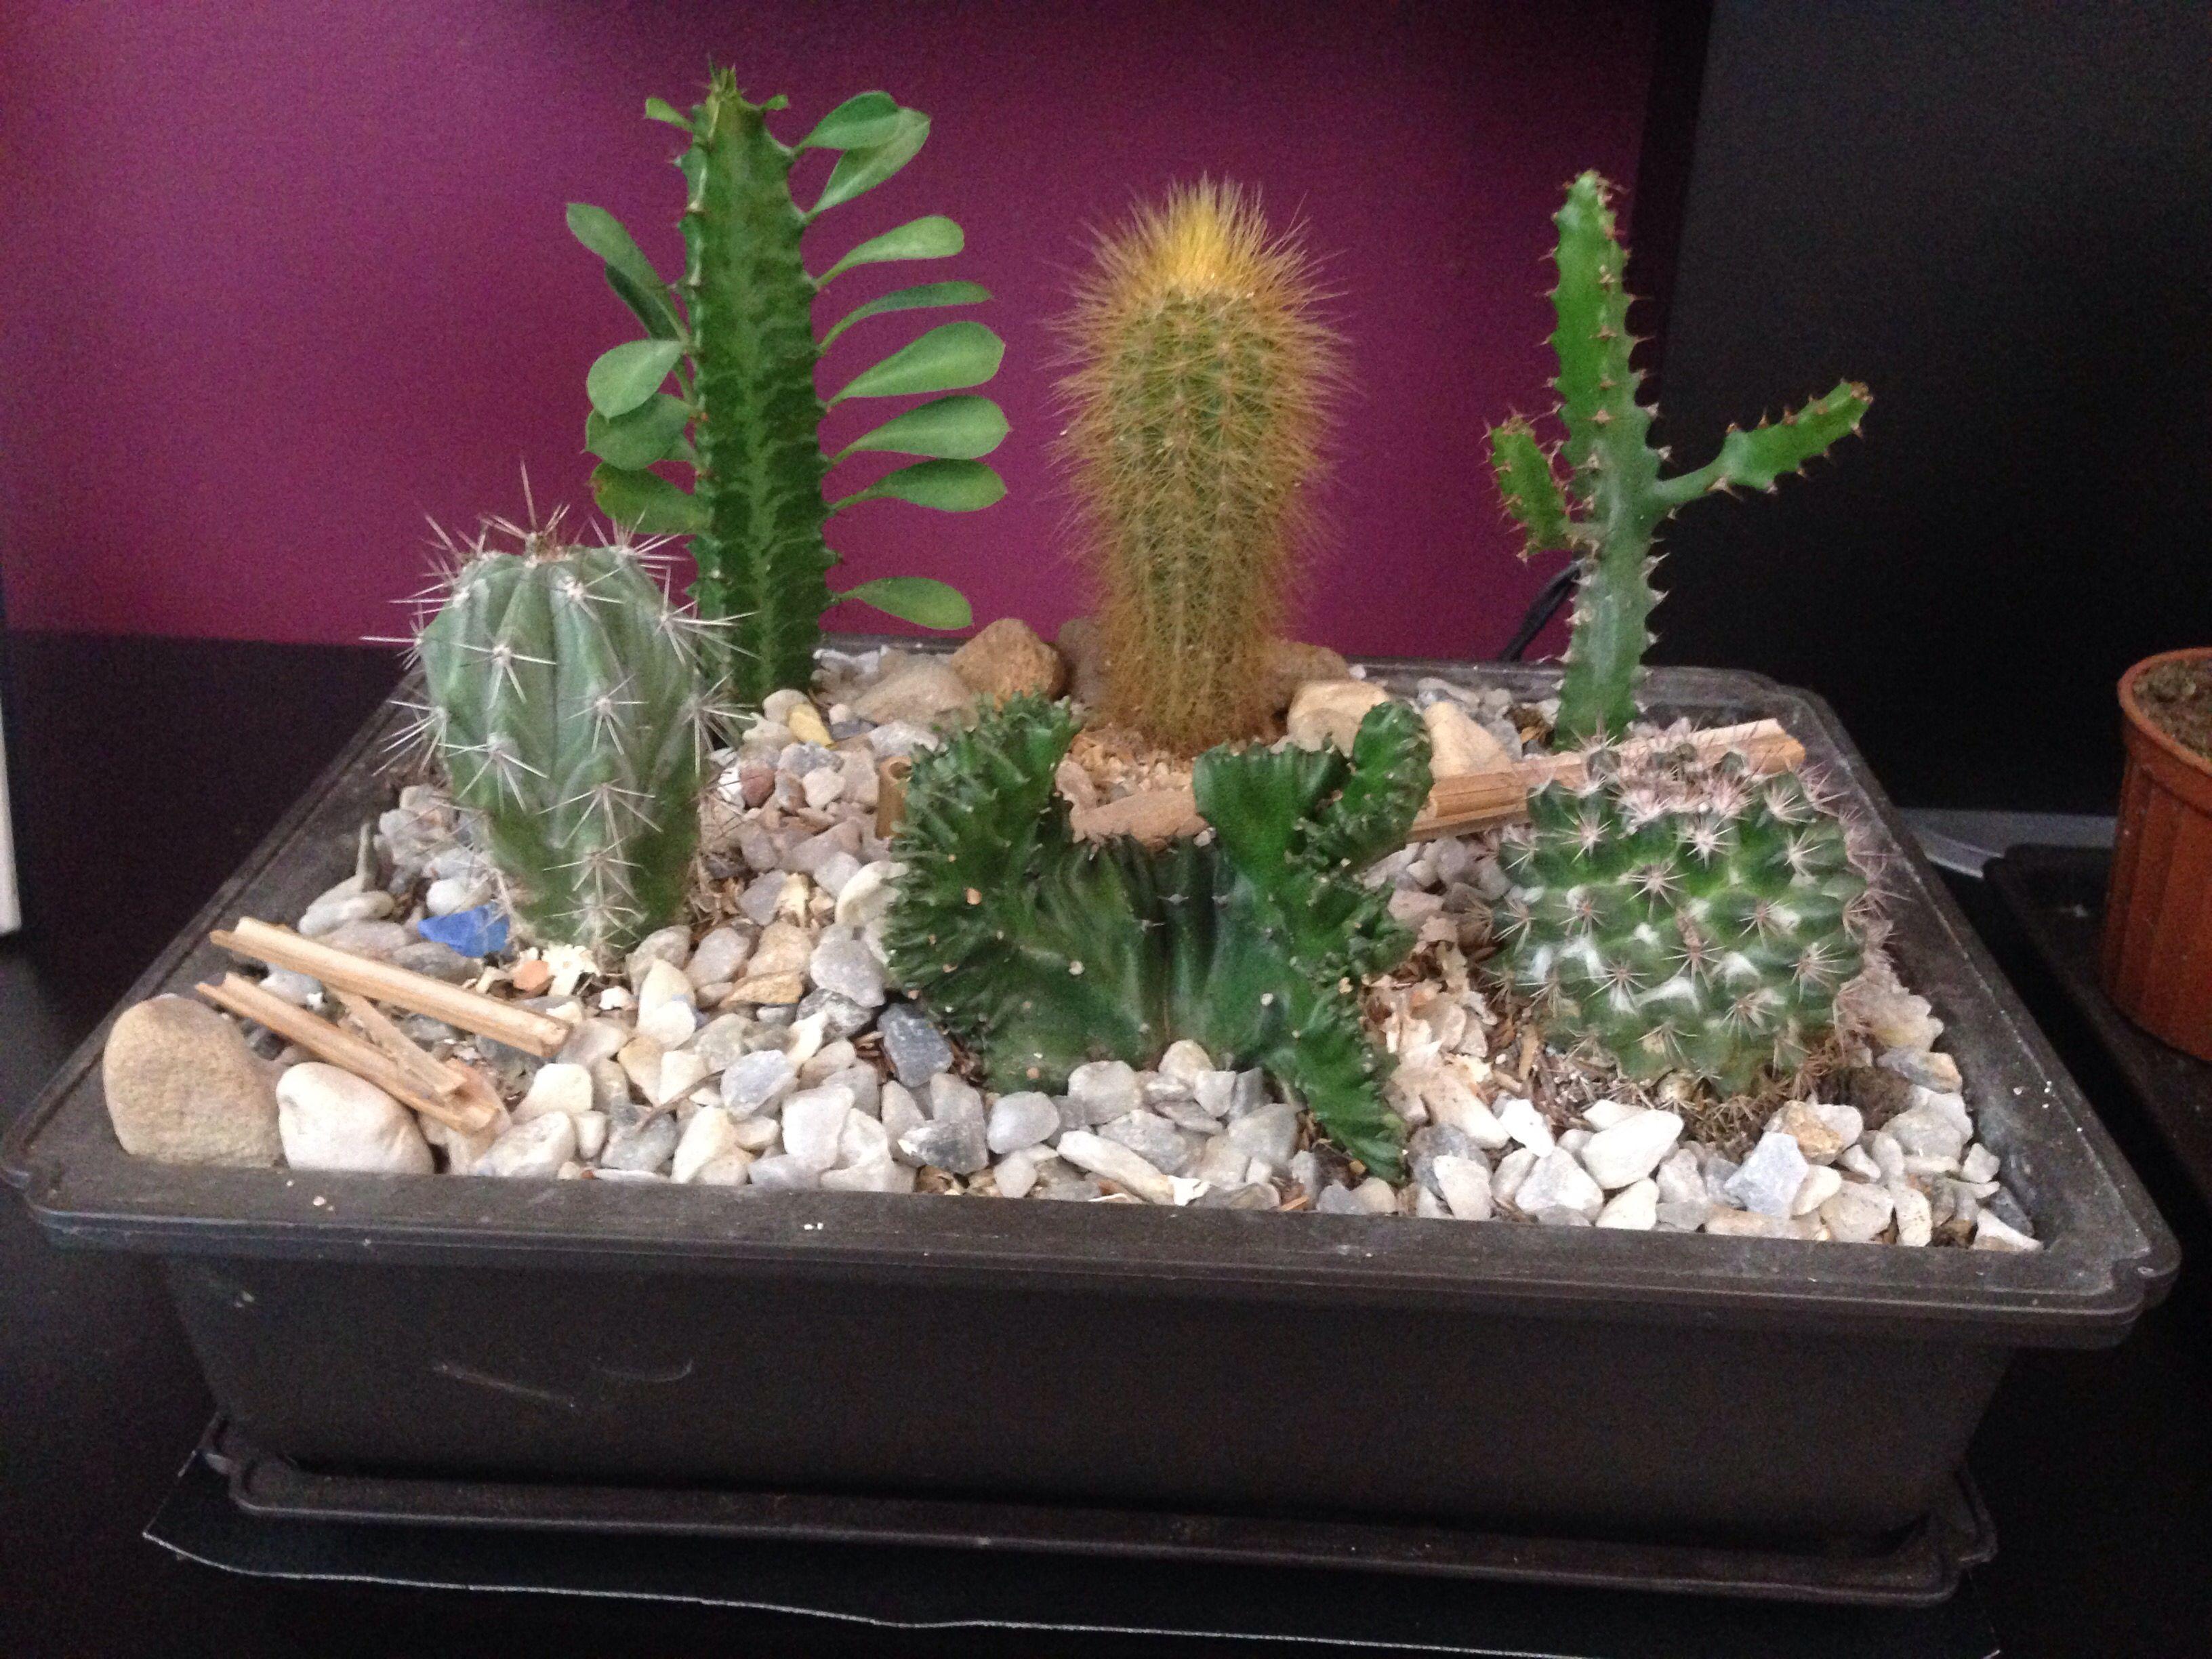 Mini jardines de cactus en macetas